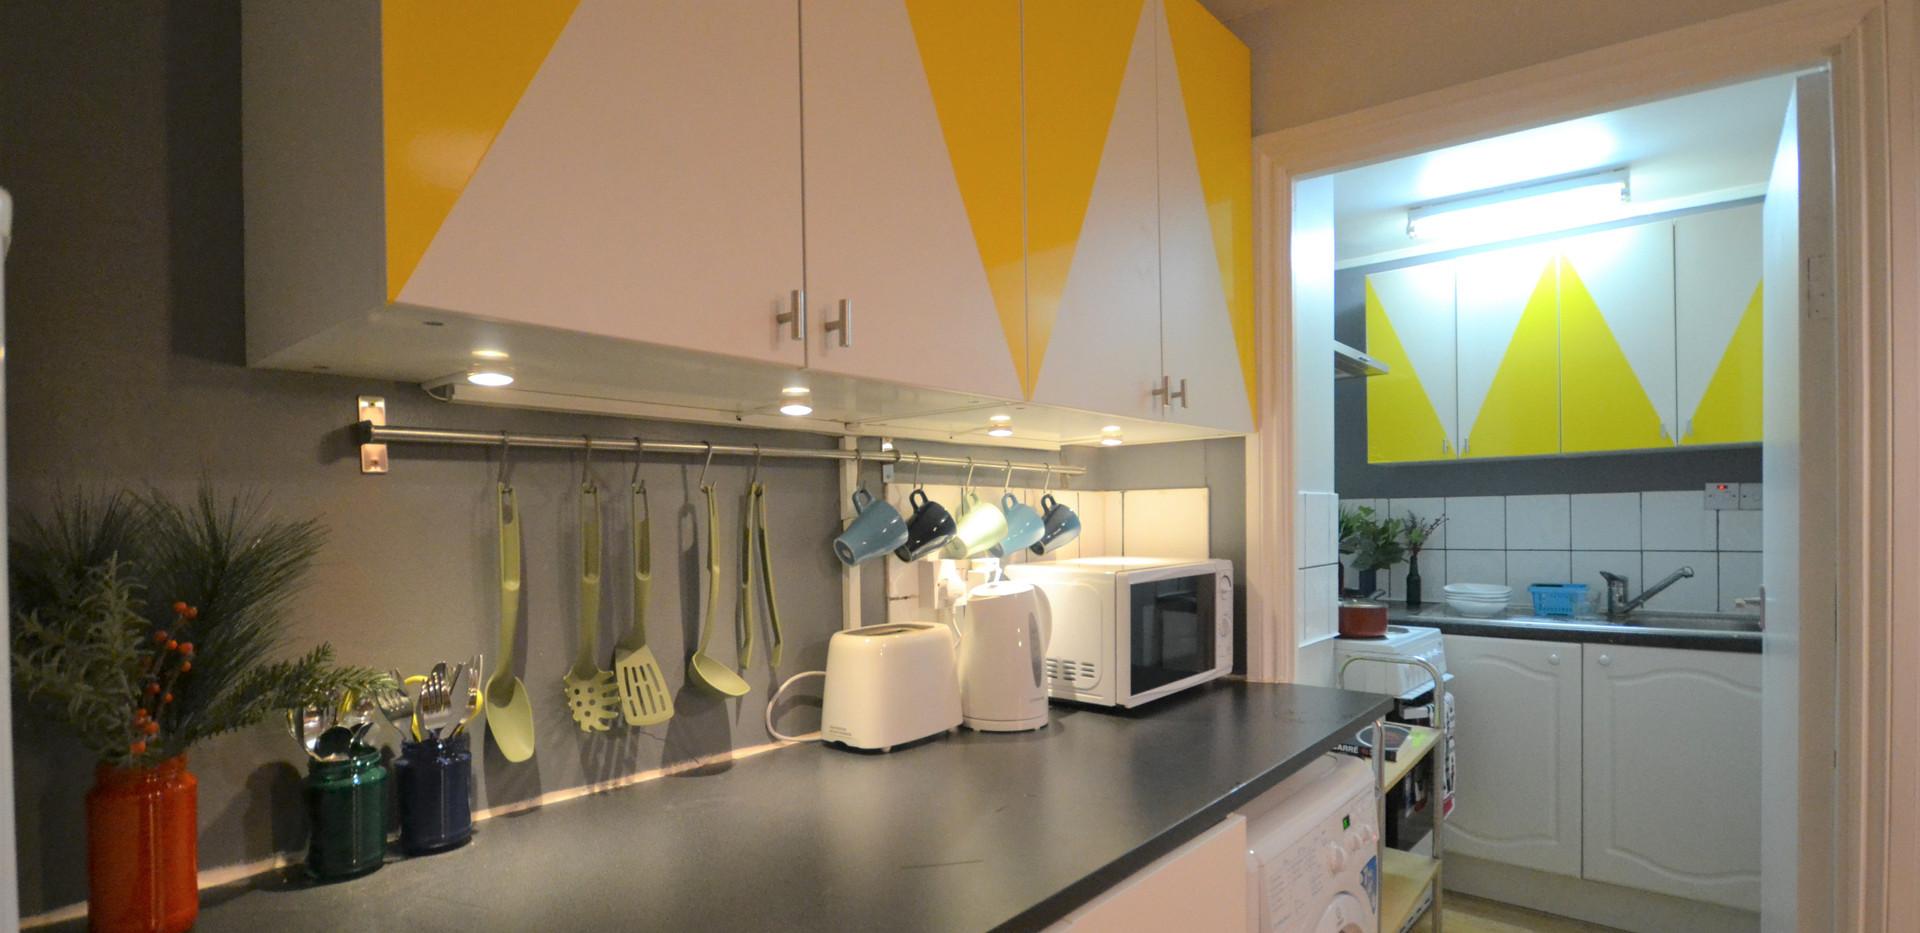 Shared Dinning & Kitchen Area